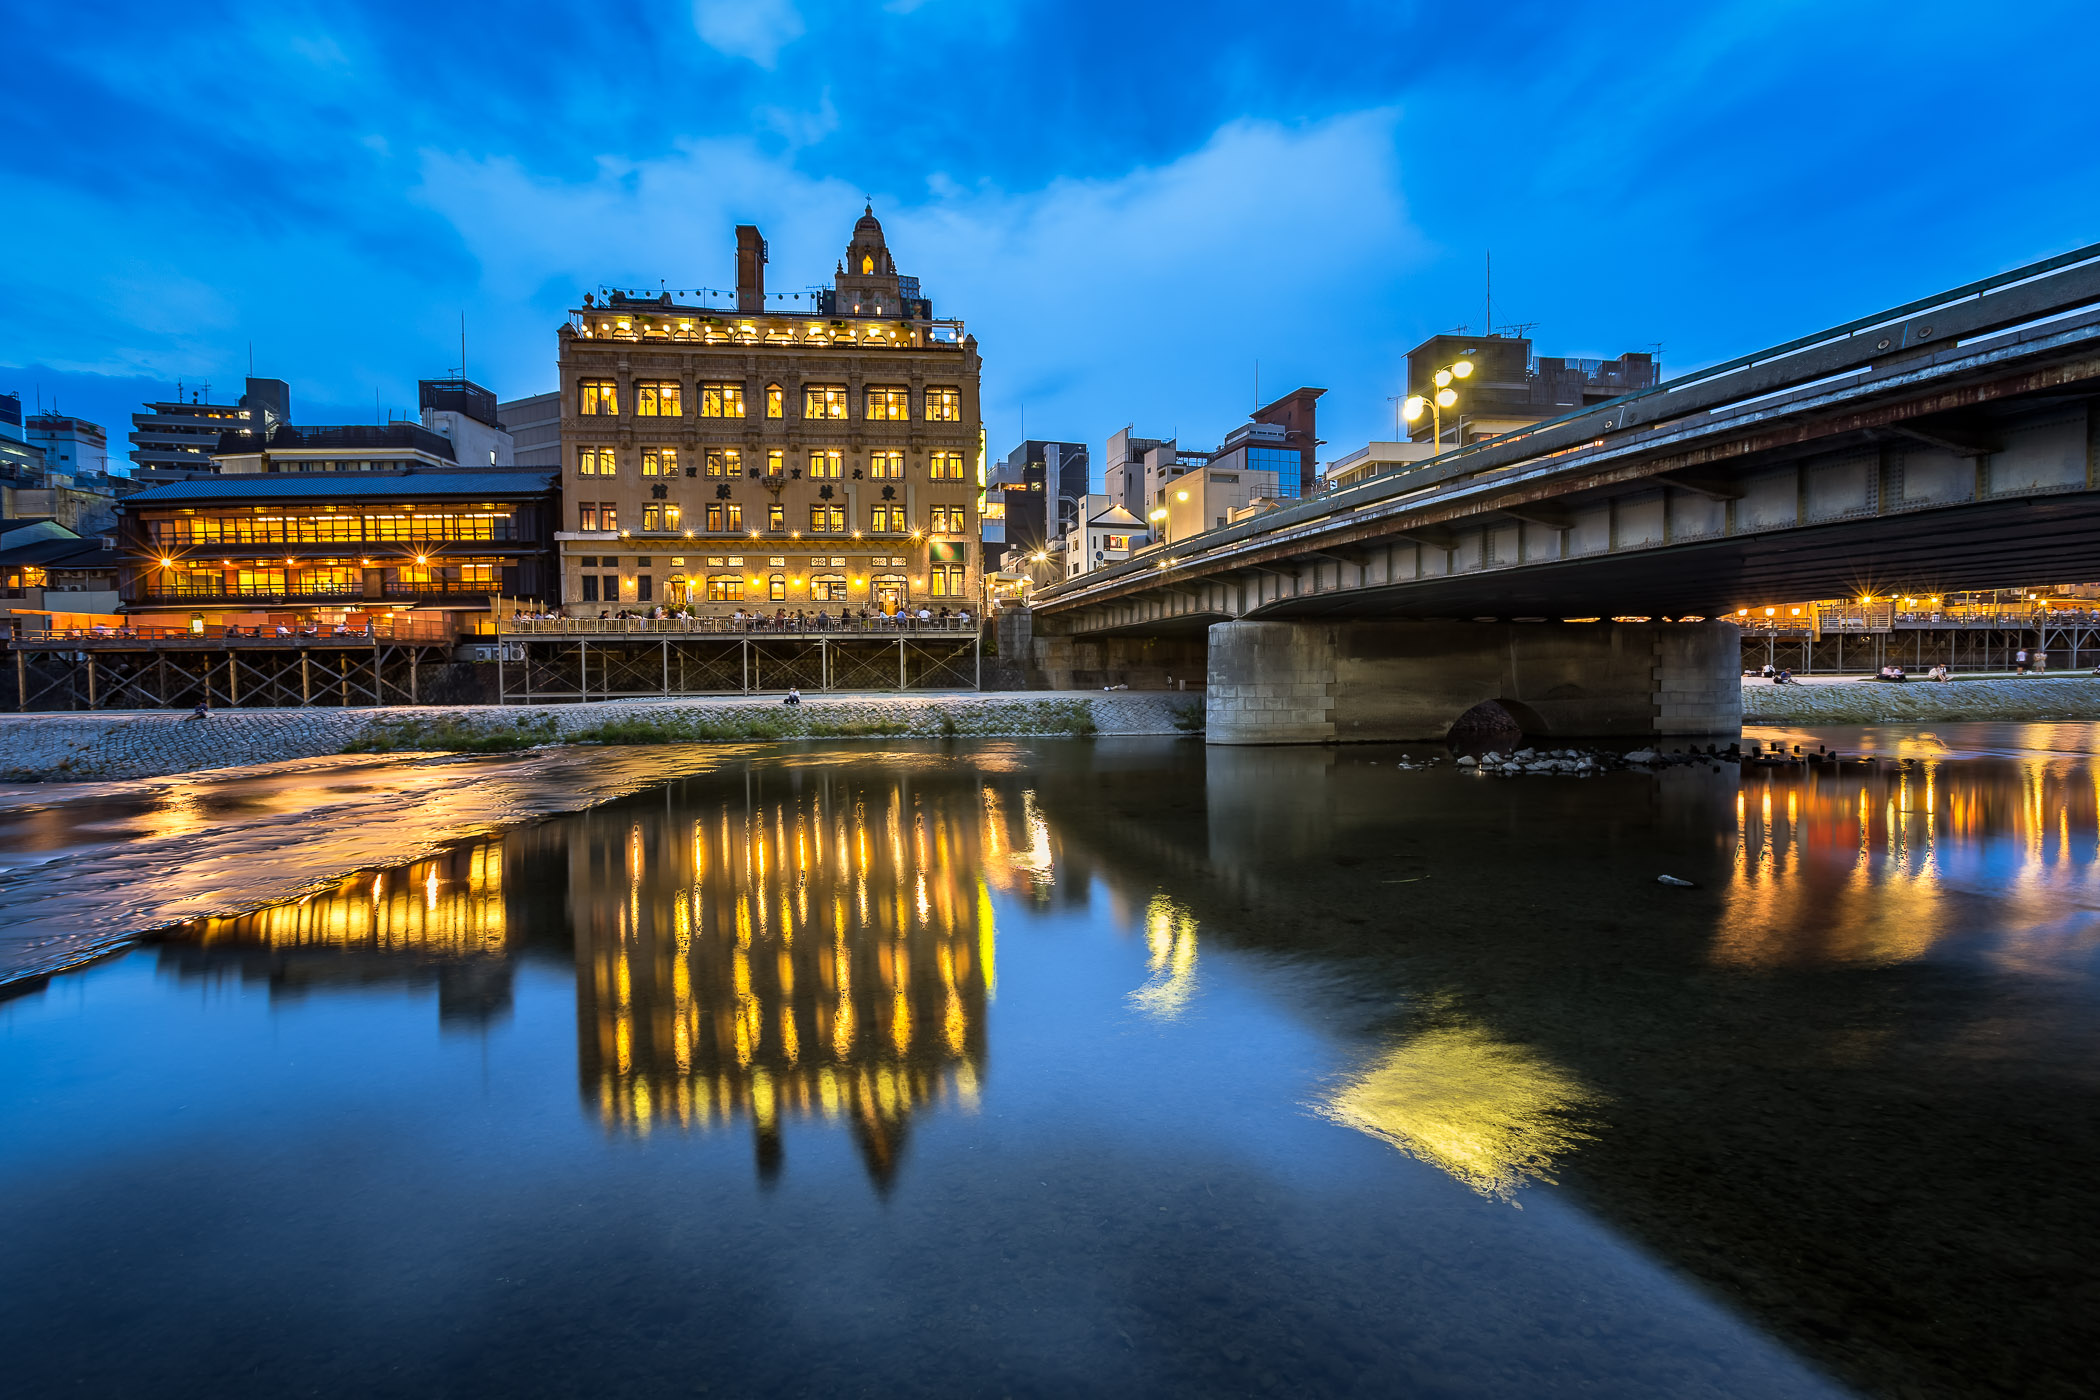 Kamo River and Shijo Dori Bridge in the Evening, Kyoto, Japan